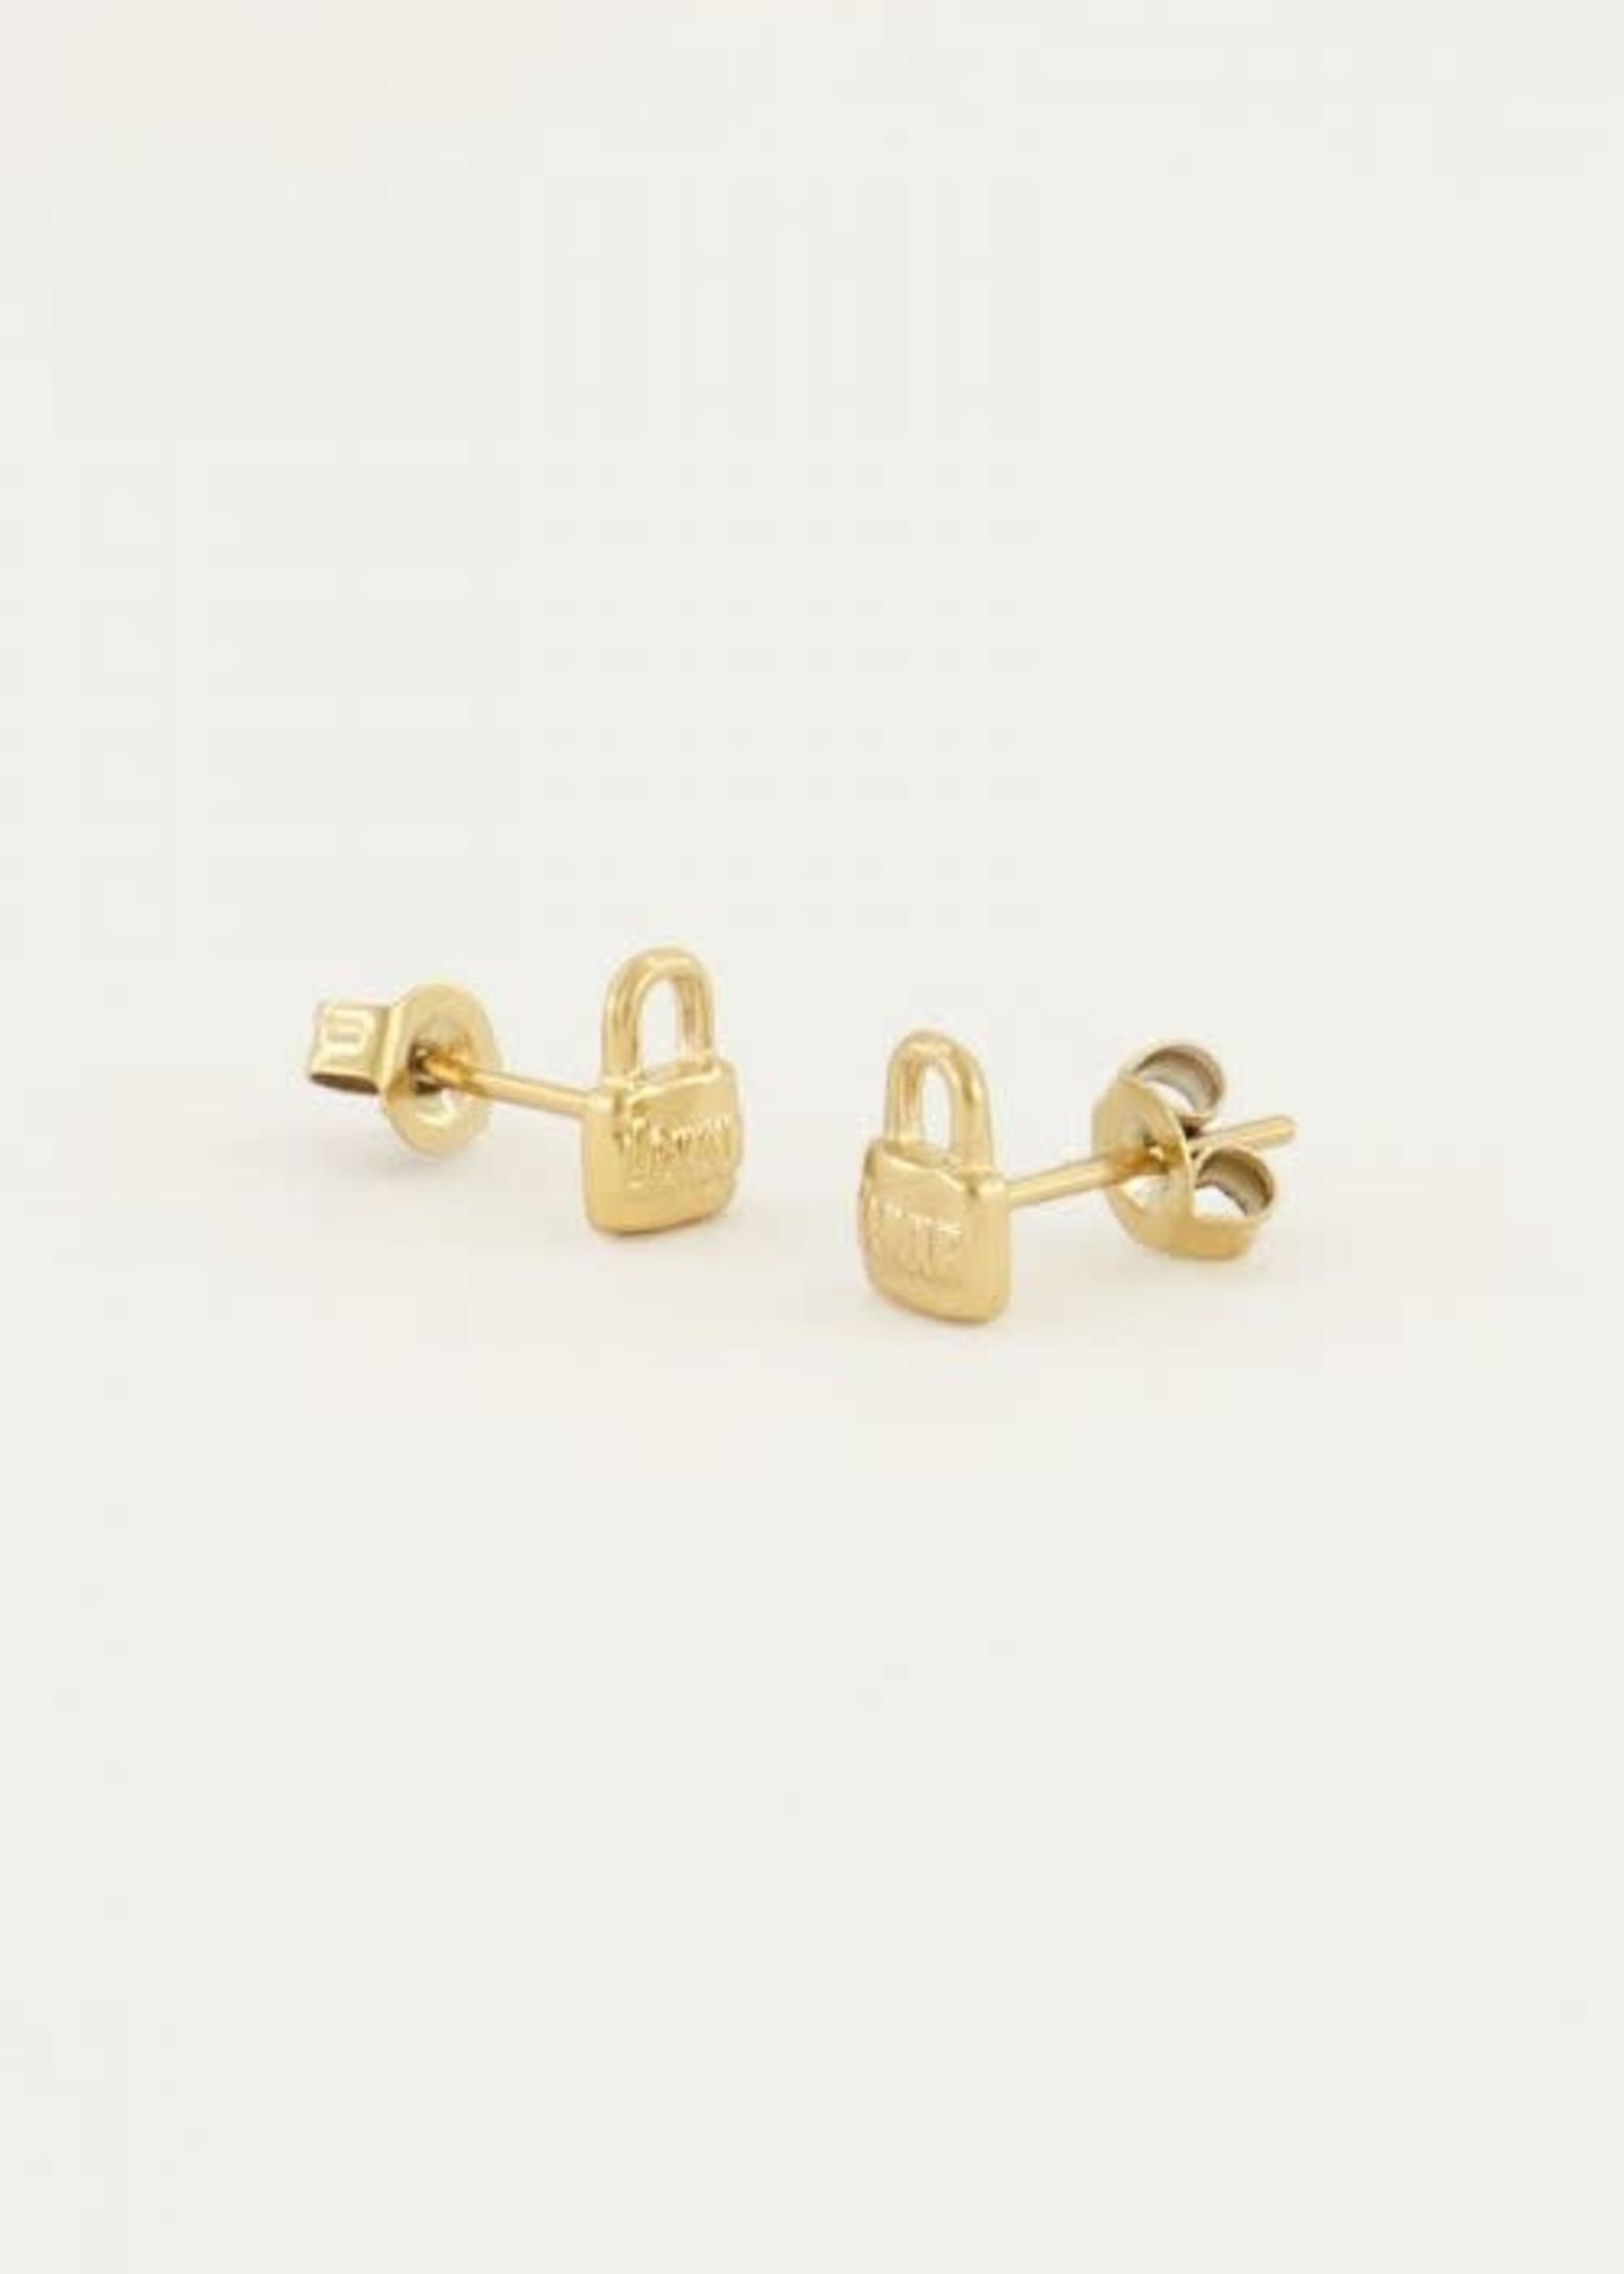 My Jewellery My Jewellery earstuds - love lock